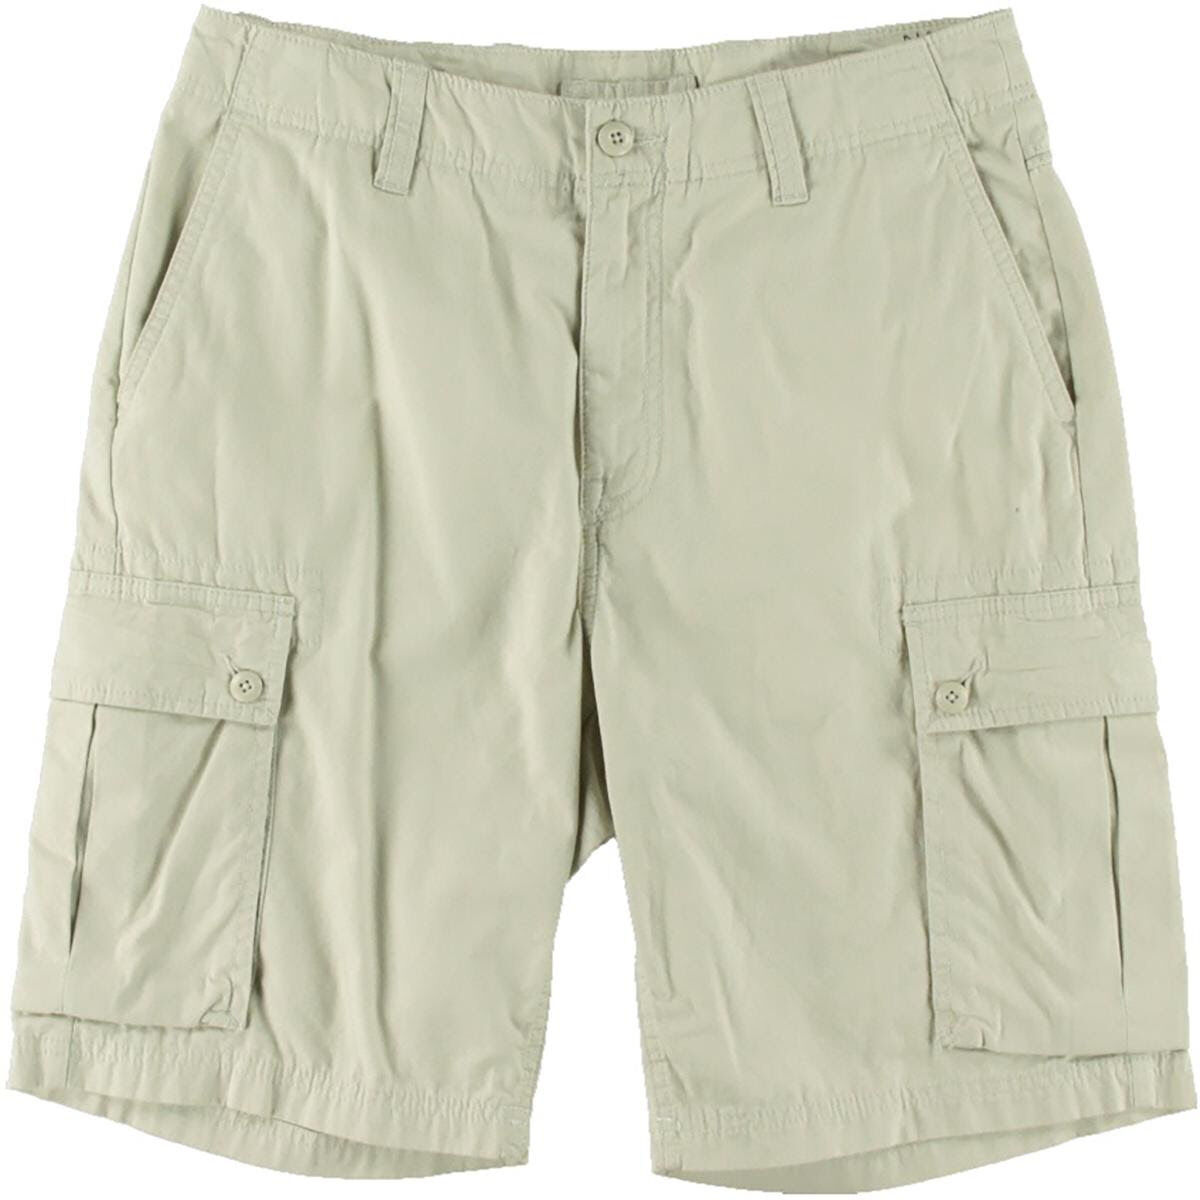 24fab50825c6 Nautica Cargo Shorts Modern Fit Stone Adjustable Cotton Size 30 NEW Mens